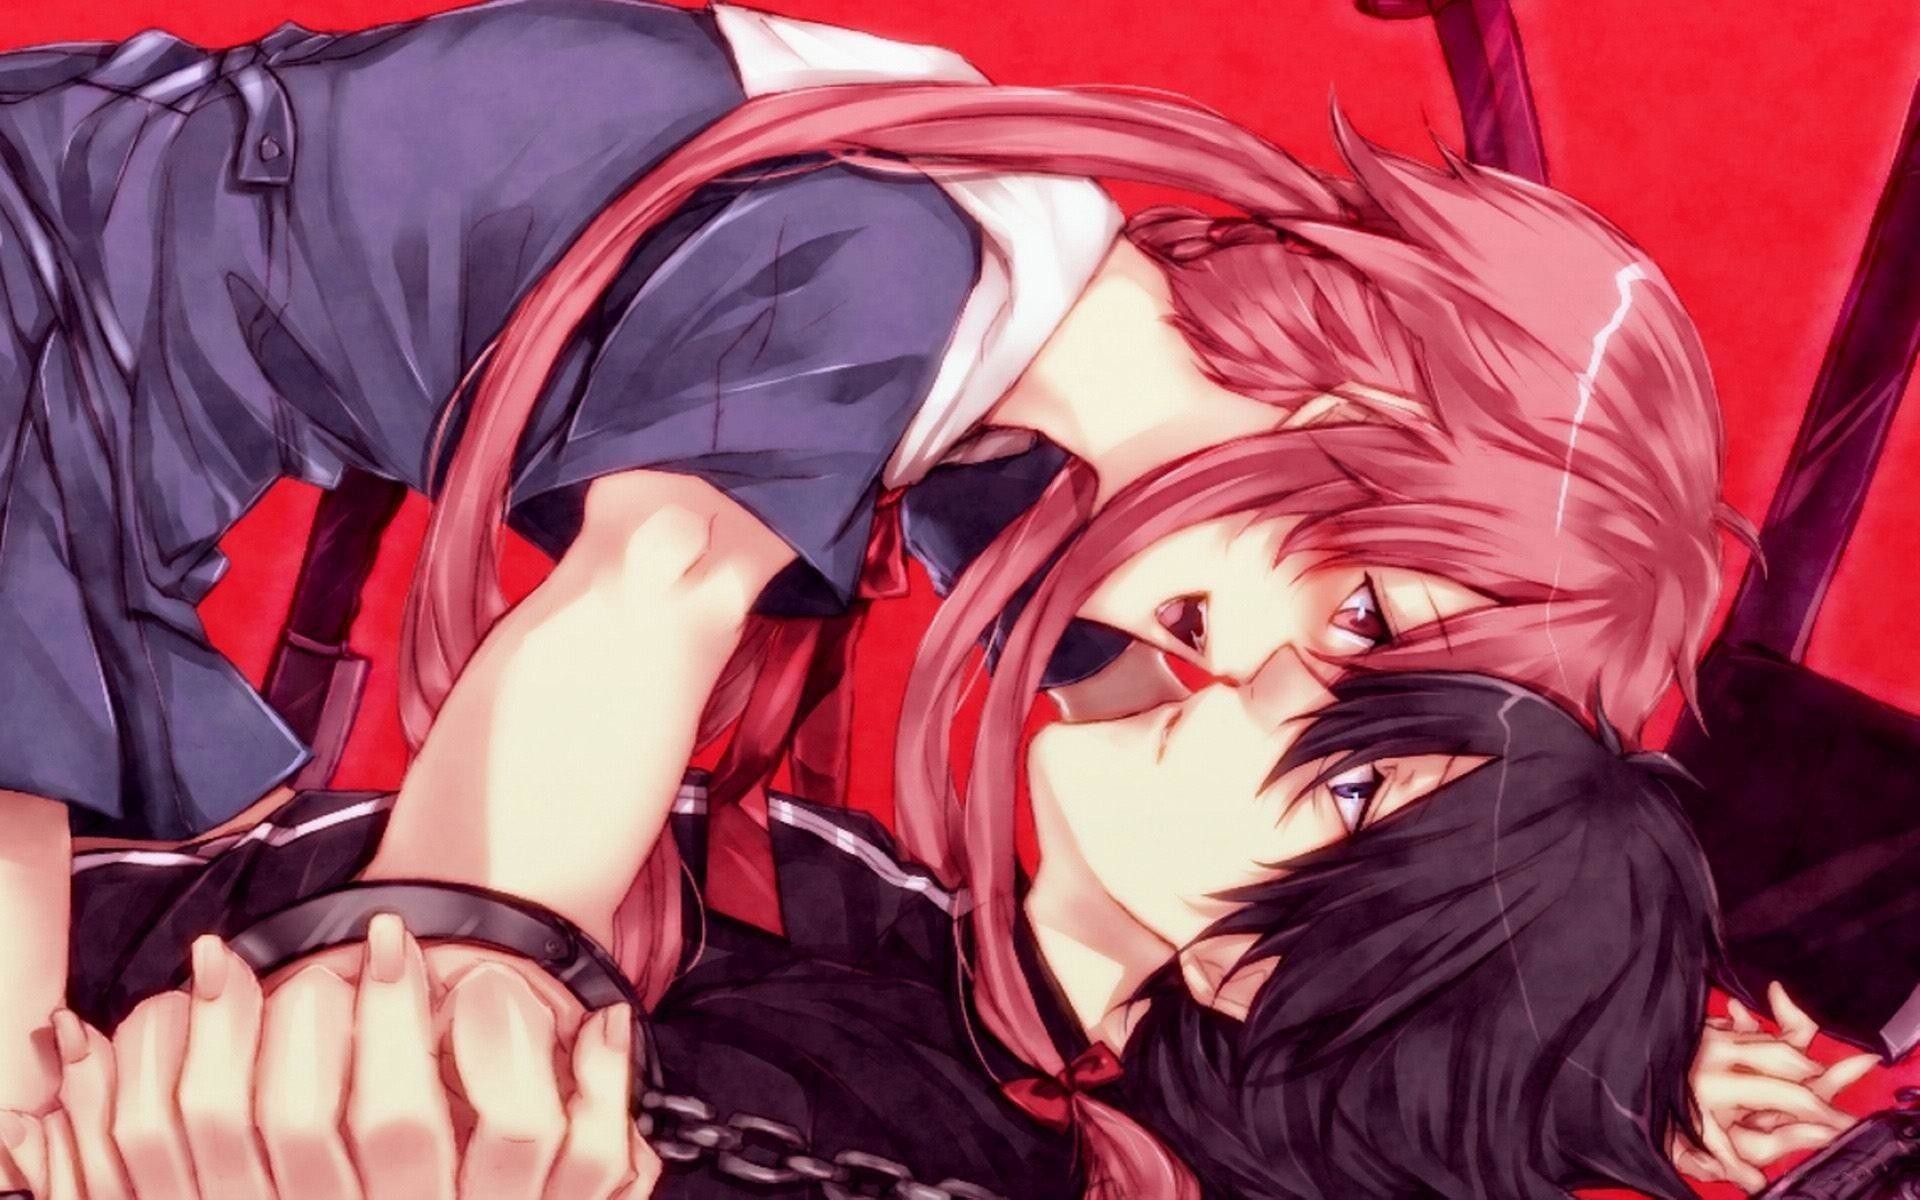 wallpaper.wiki-Cute-Anime-Couple-Photo-Free-Download-